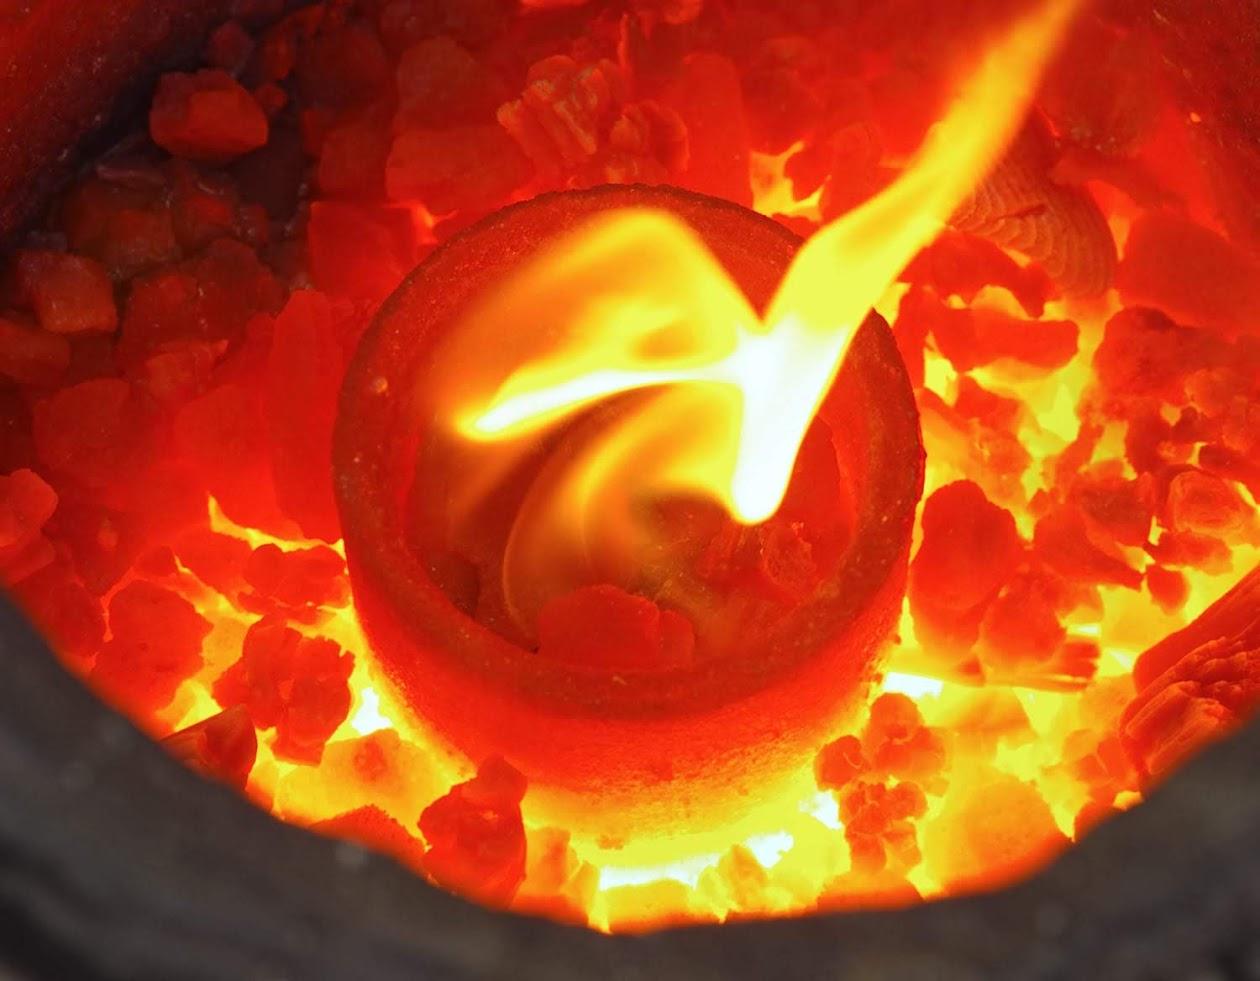 http://www.ayuryog.org/sites/default/files/copper_in_furnace_2.jpg